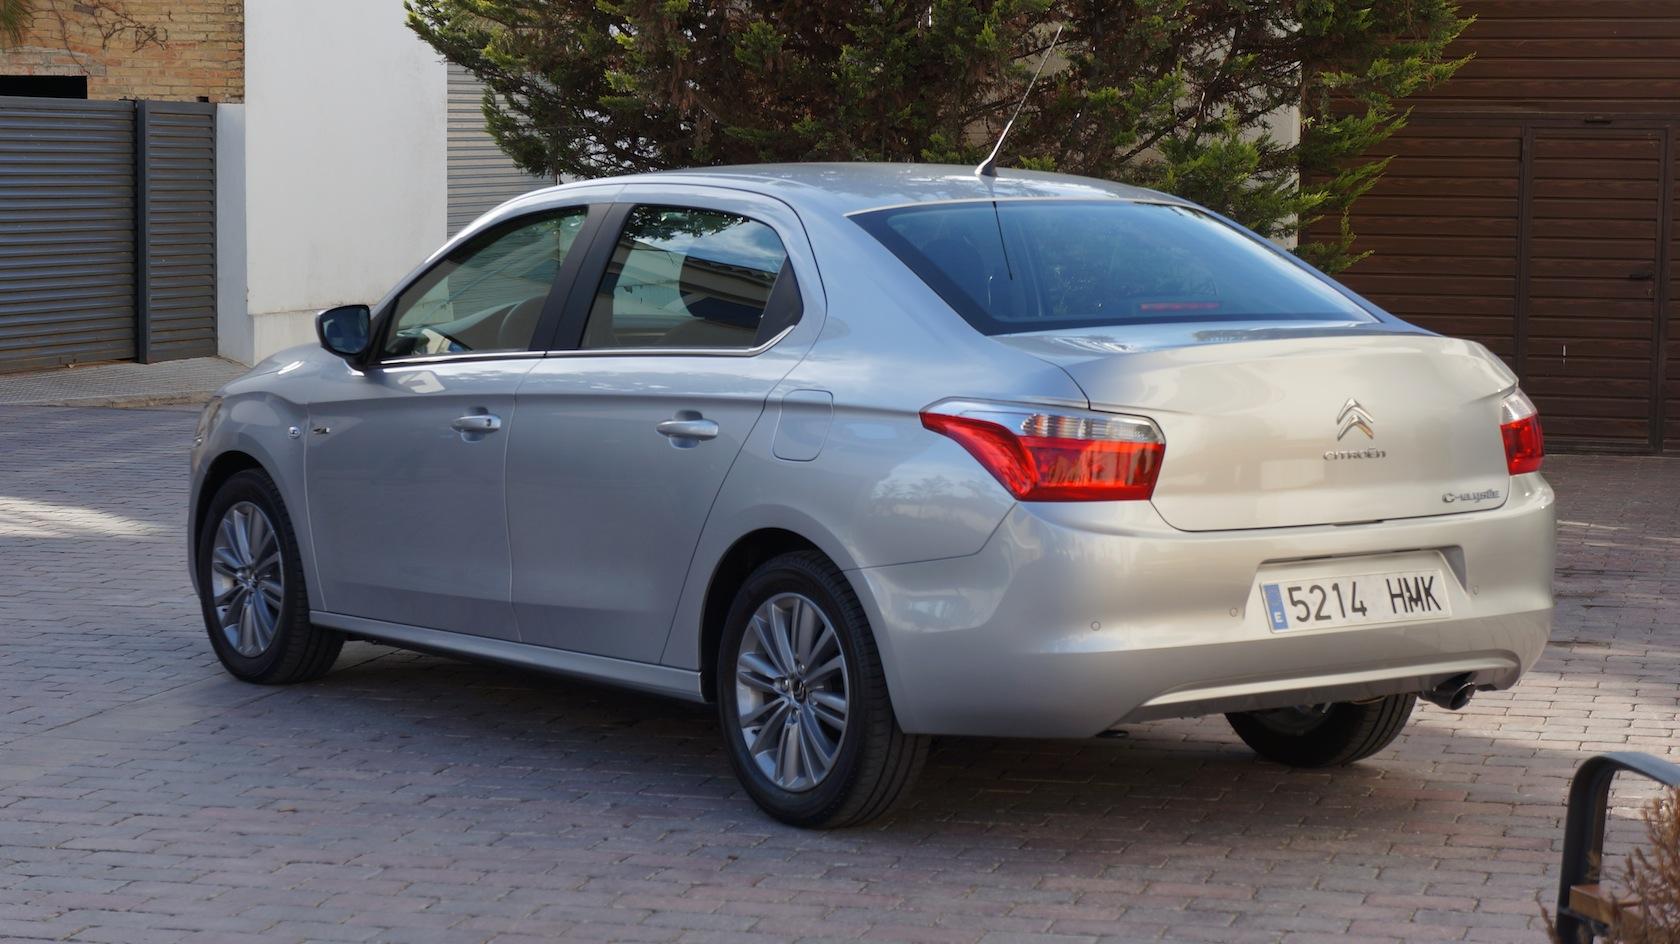 kia 2016 tunisie new car release date and review 2018 amanda felicia. Black Bedroom Furniture Sets. Home Design Ideas